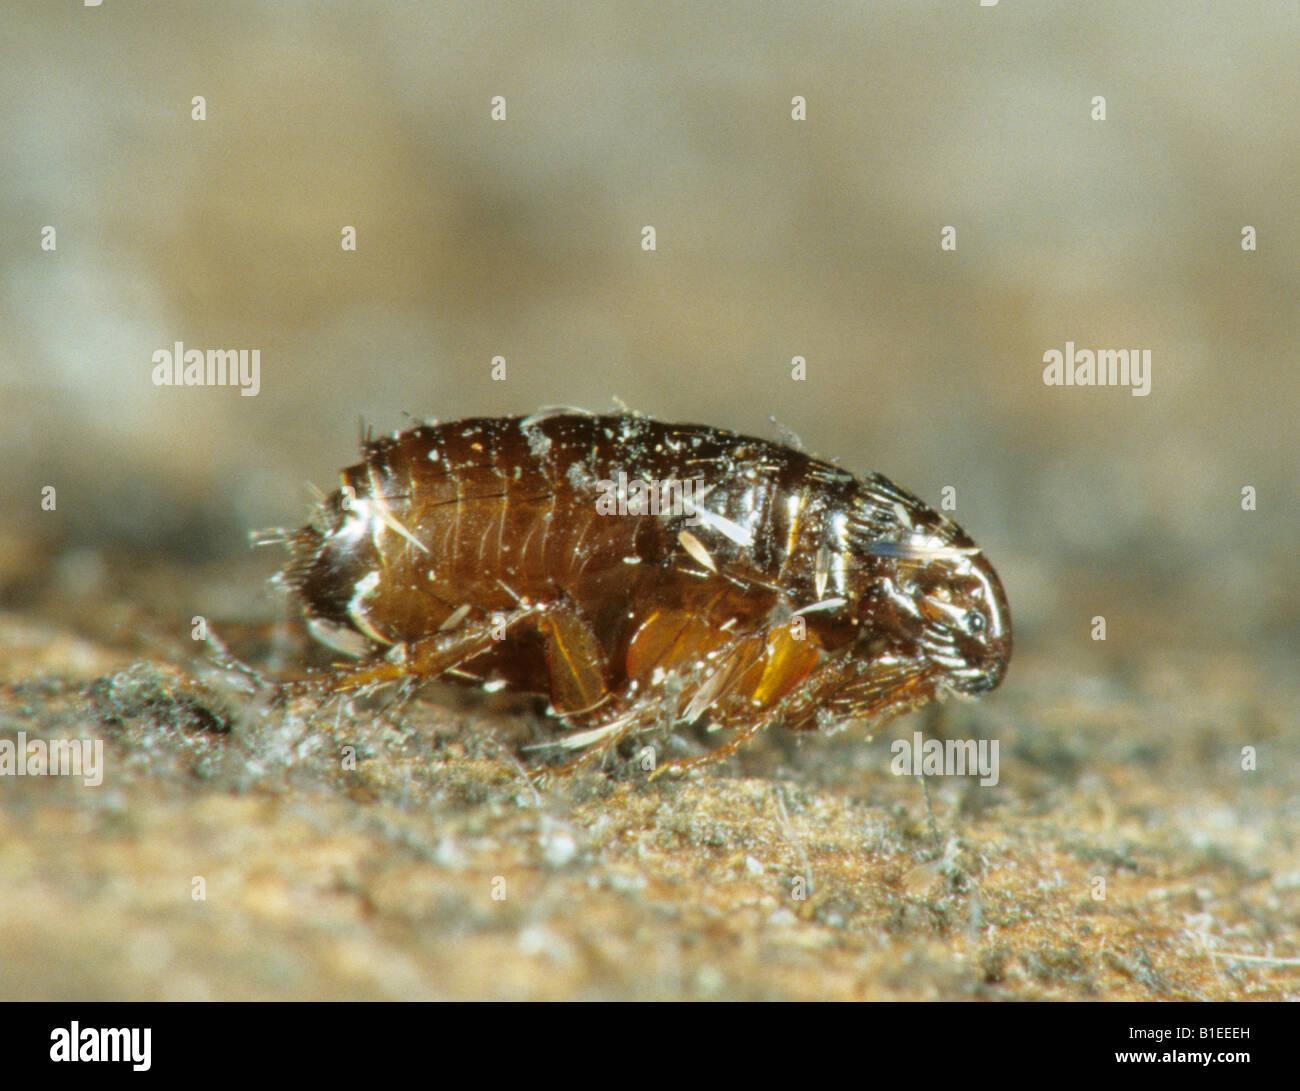 Cat Flea (Ctenocephalides felis) - Stock Image